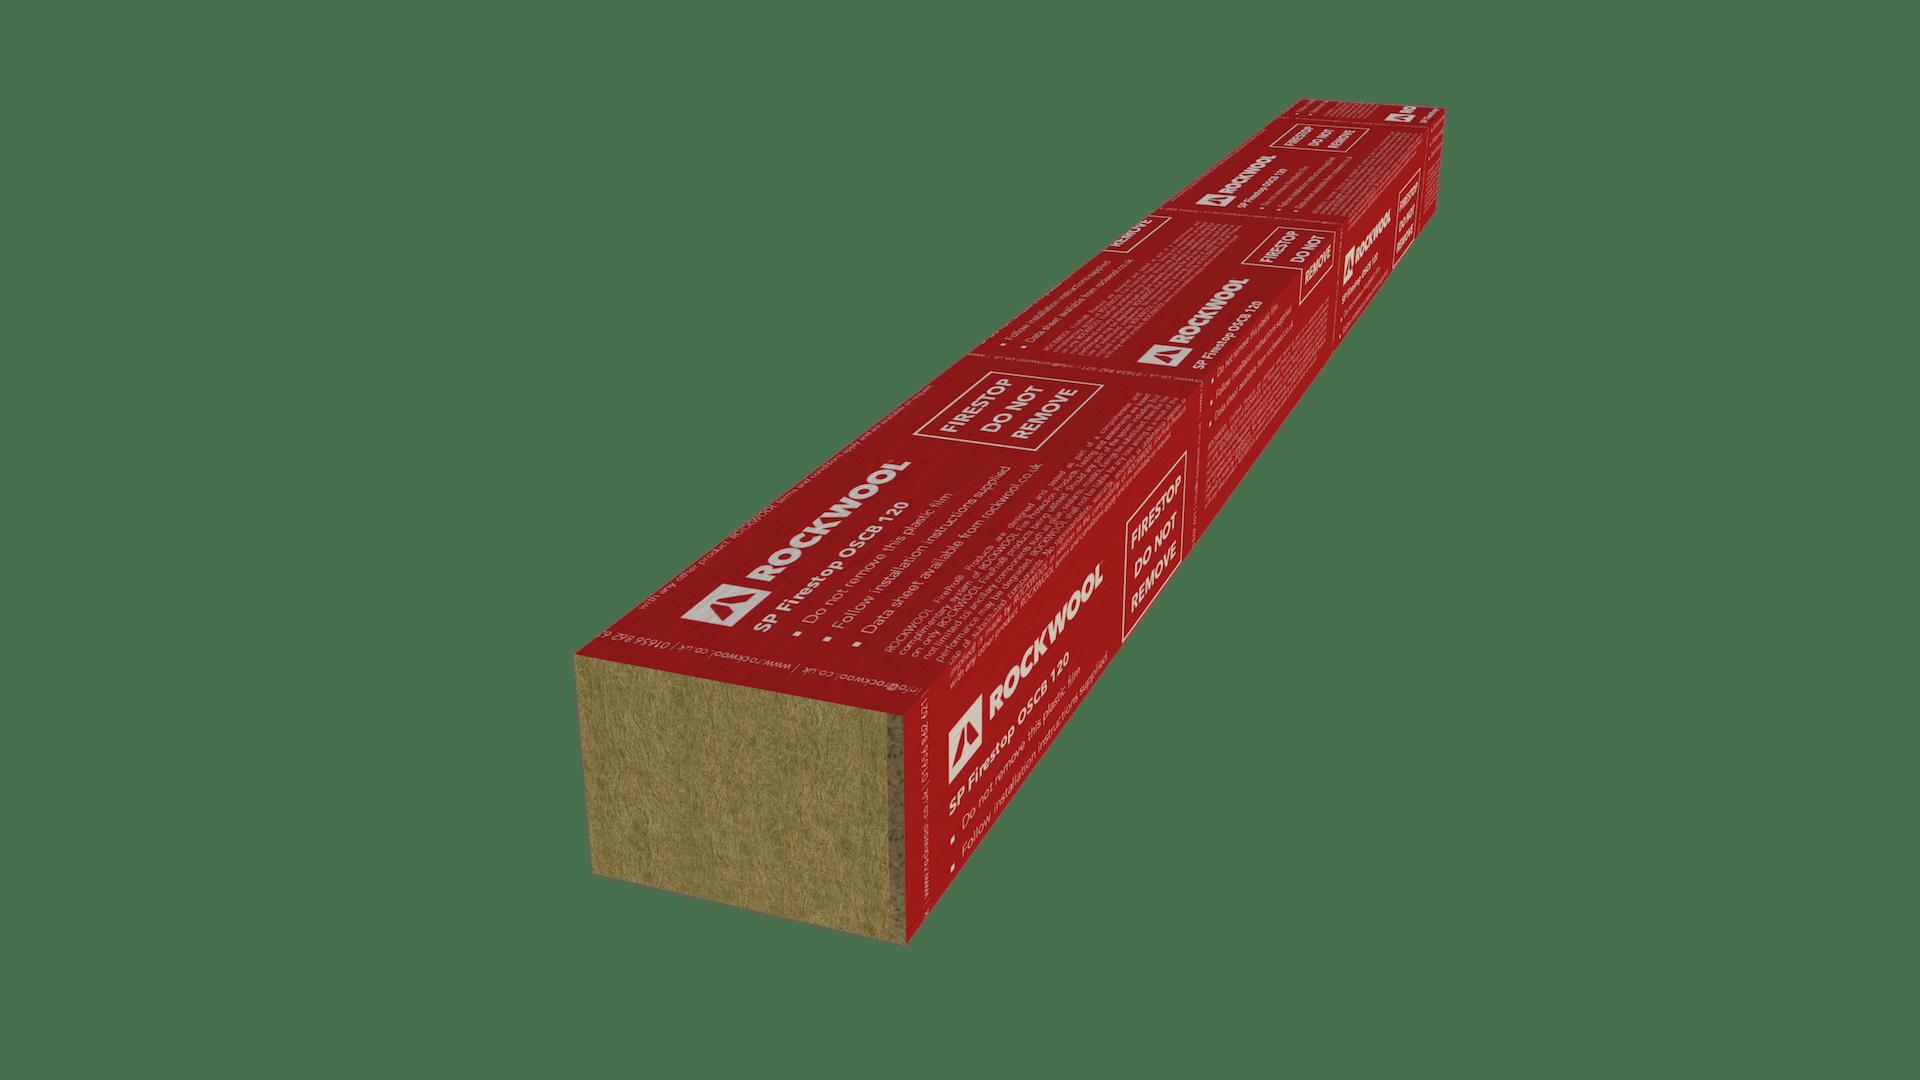 OSCB 120 (Standard)